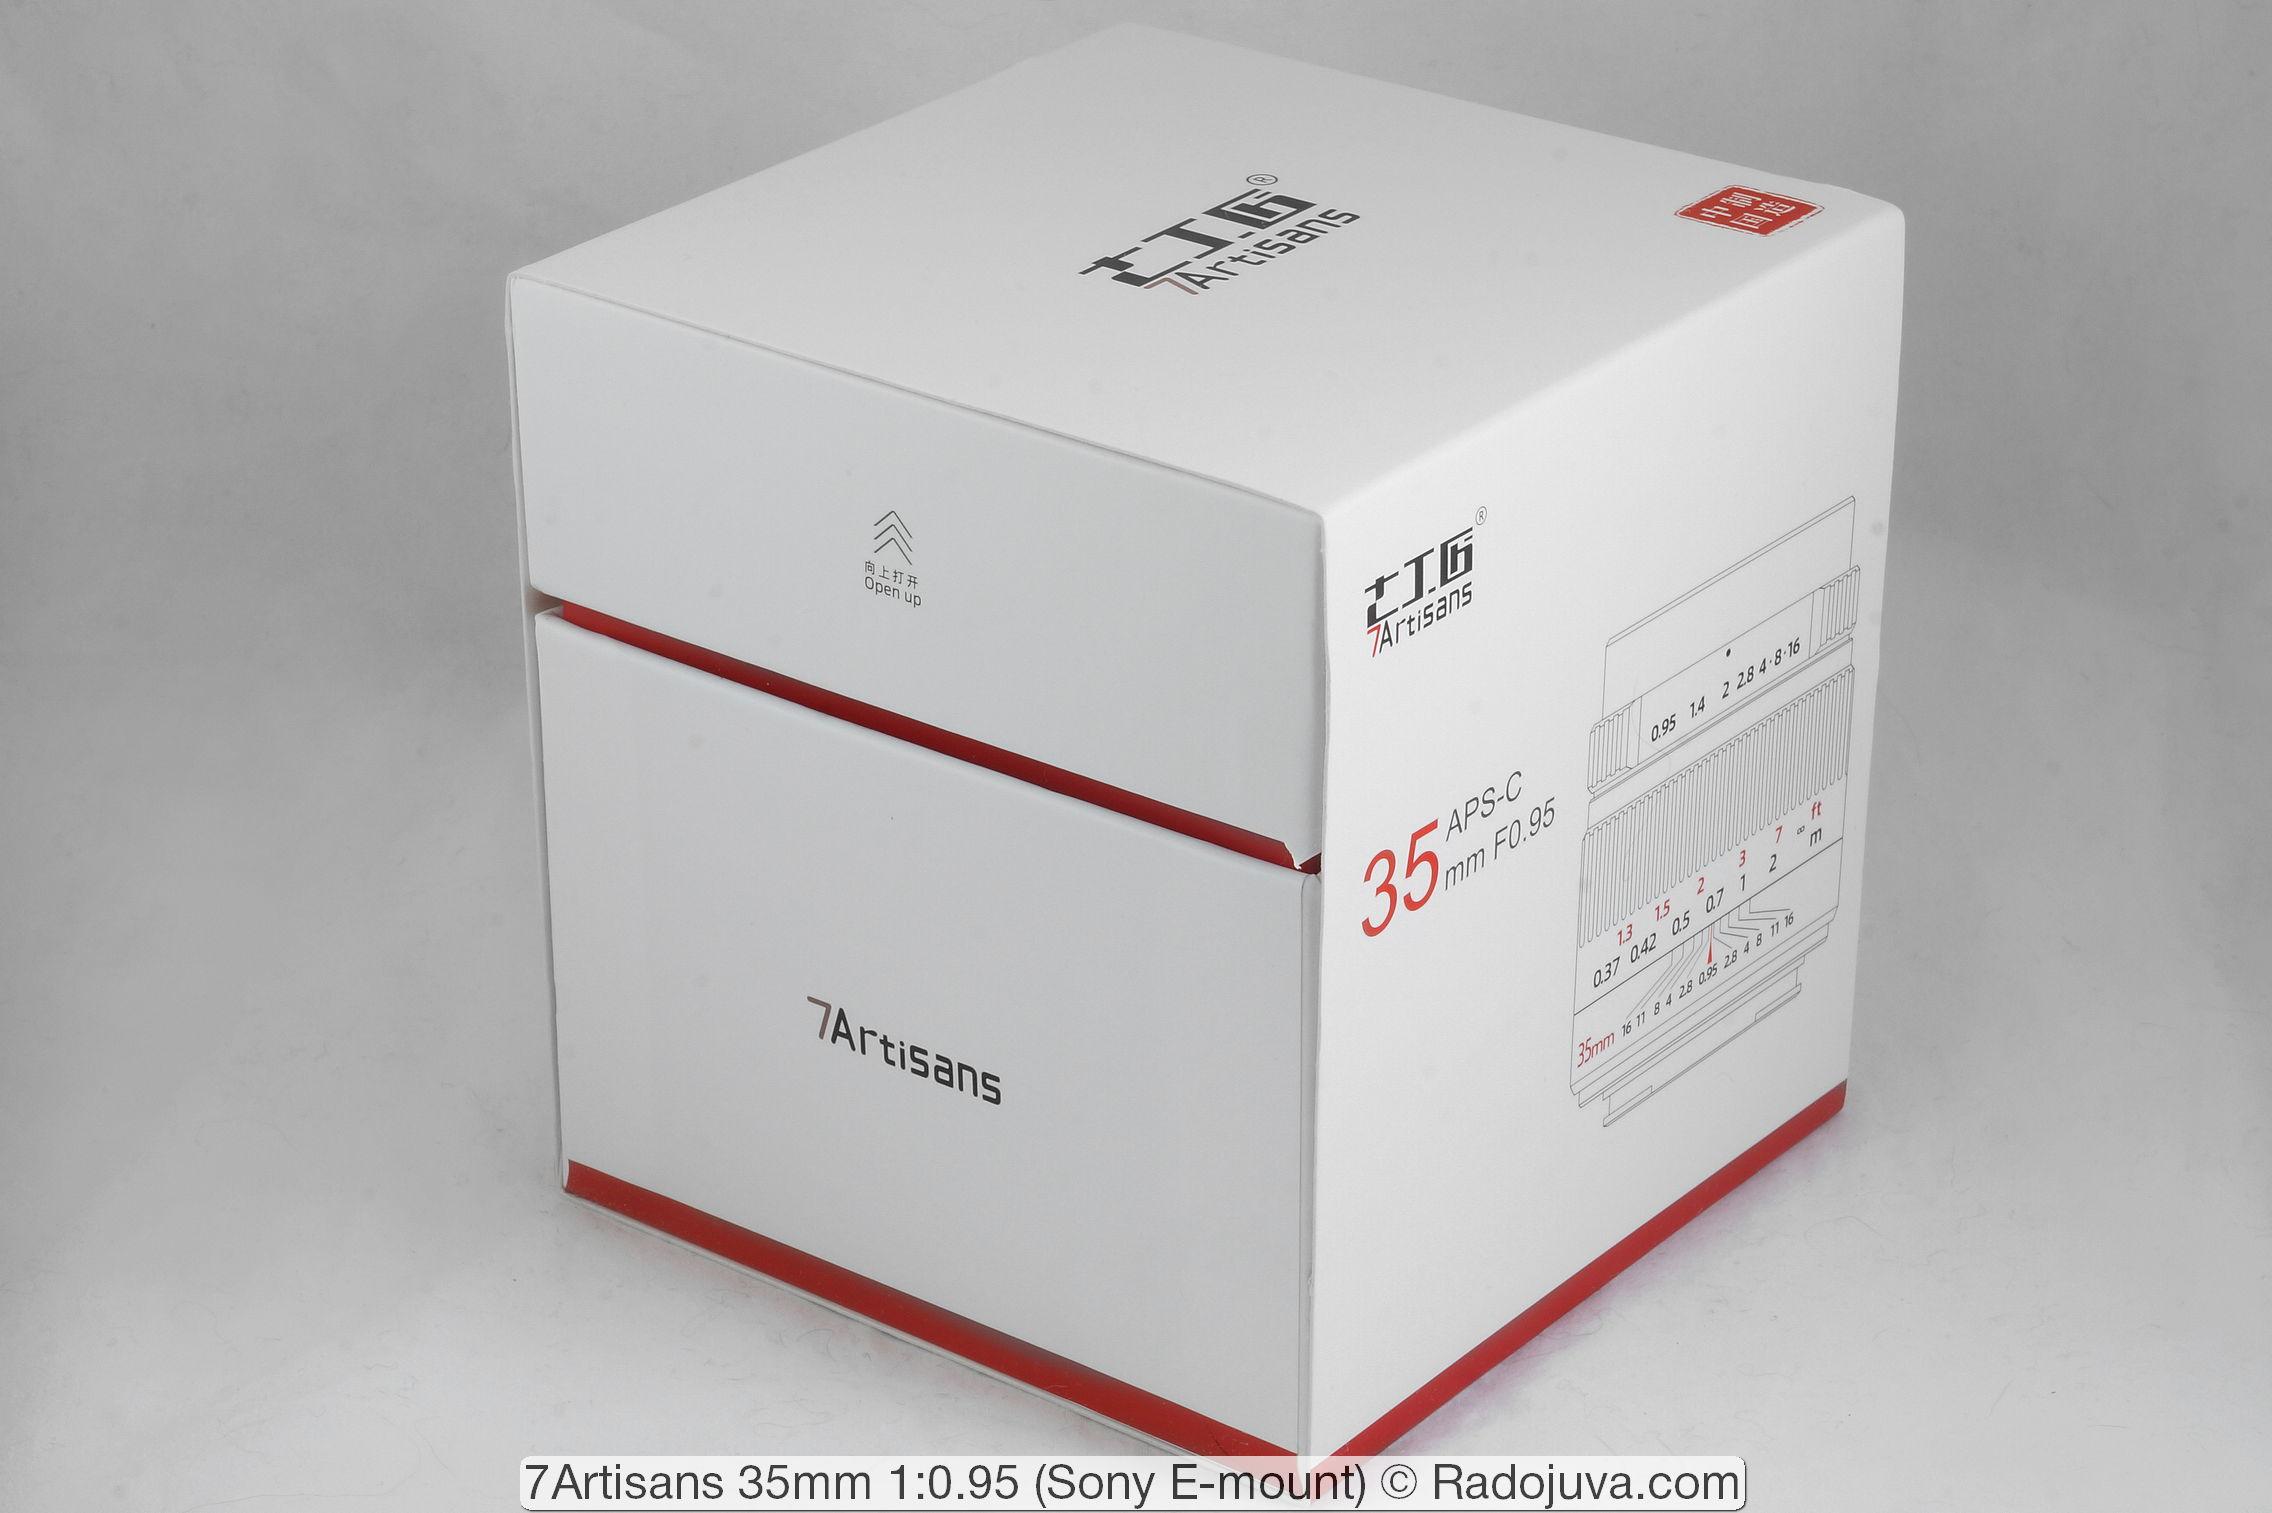 Packaging 7Artisans 35mm 1: 0.95